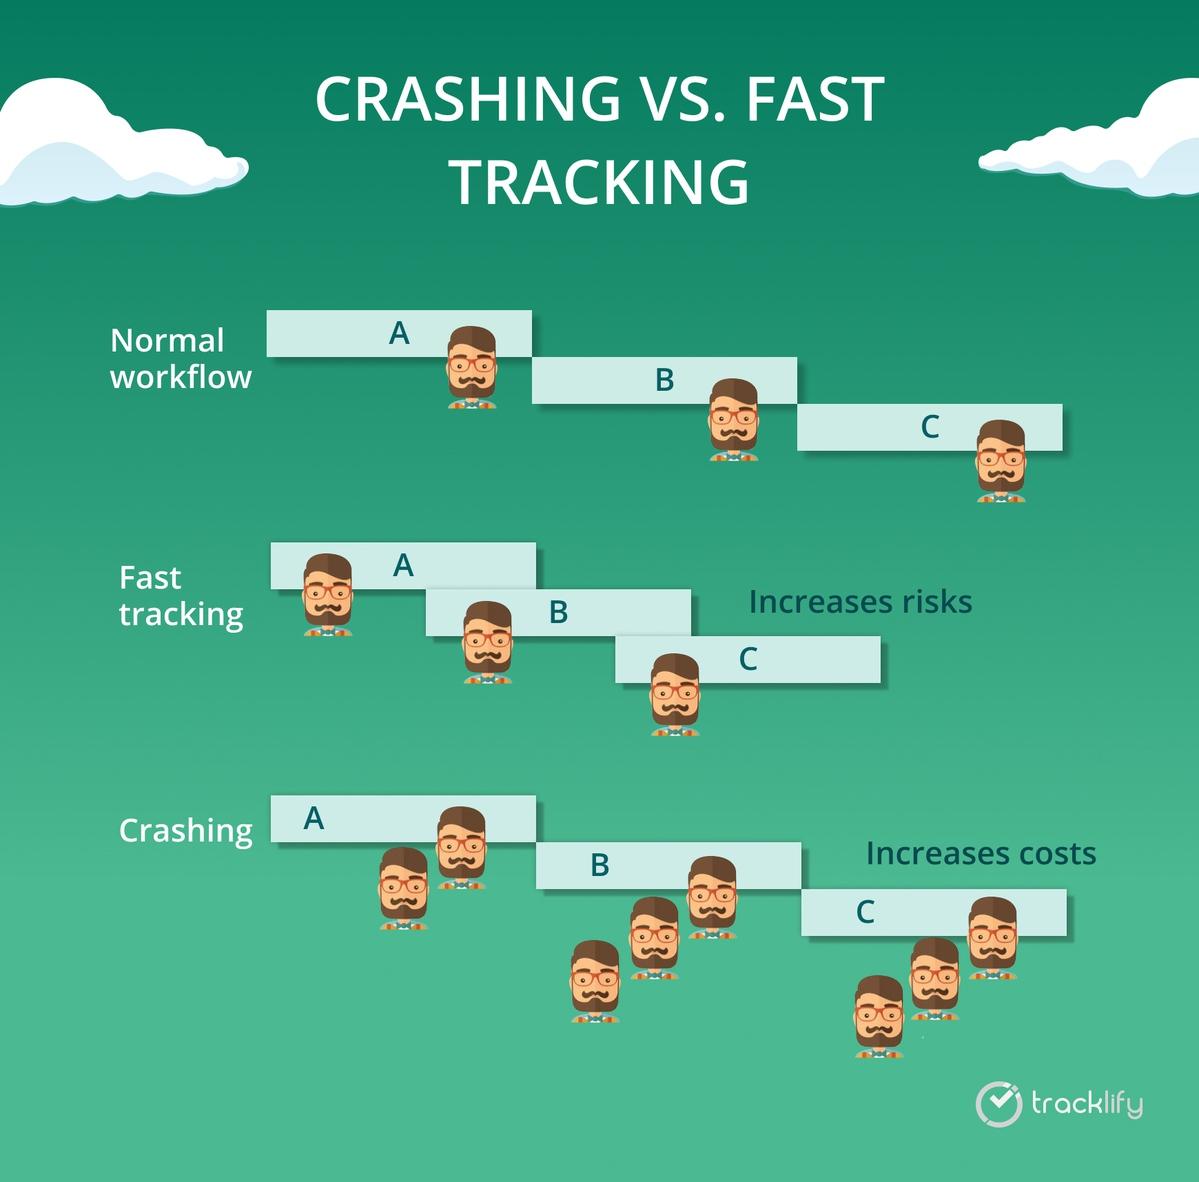 crashing vs fast tracking